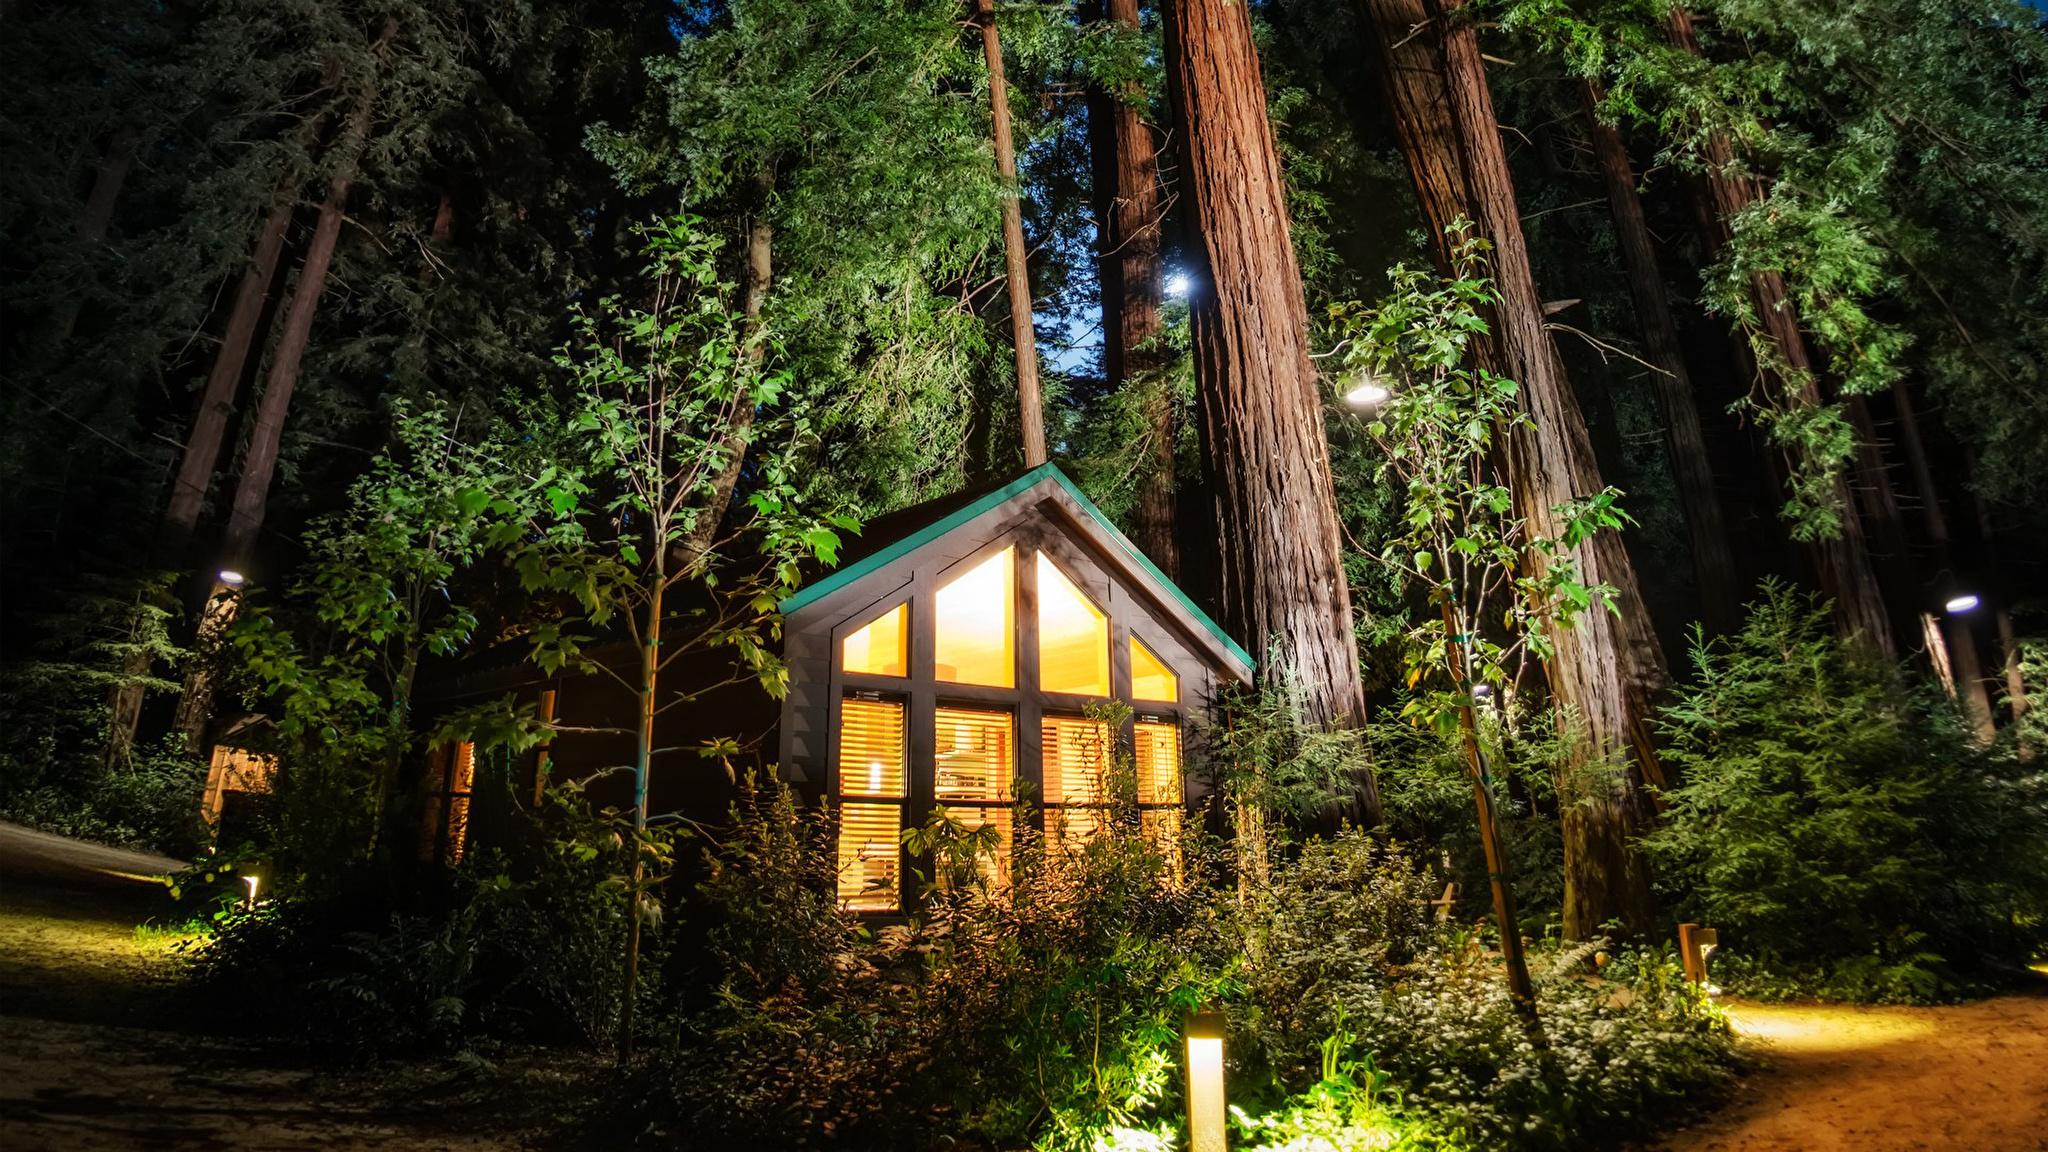 дом лес огни ночь анонимно